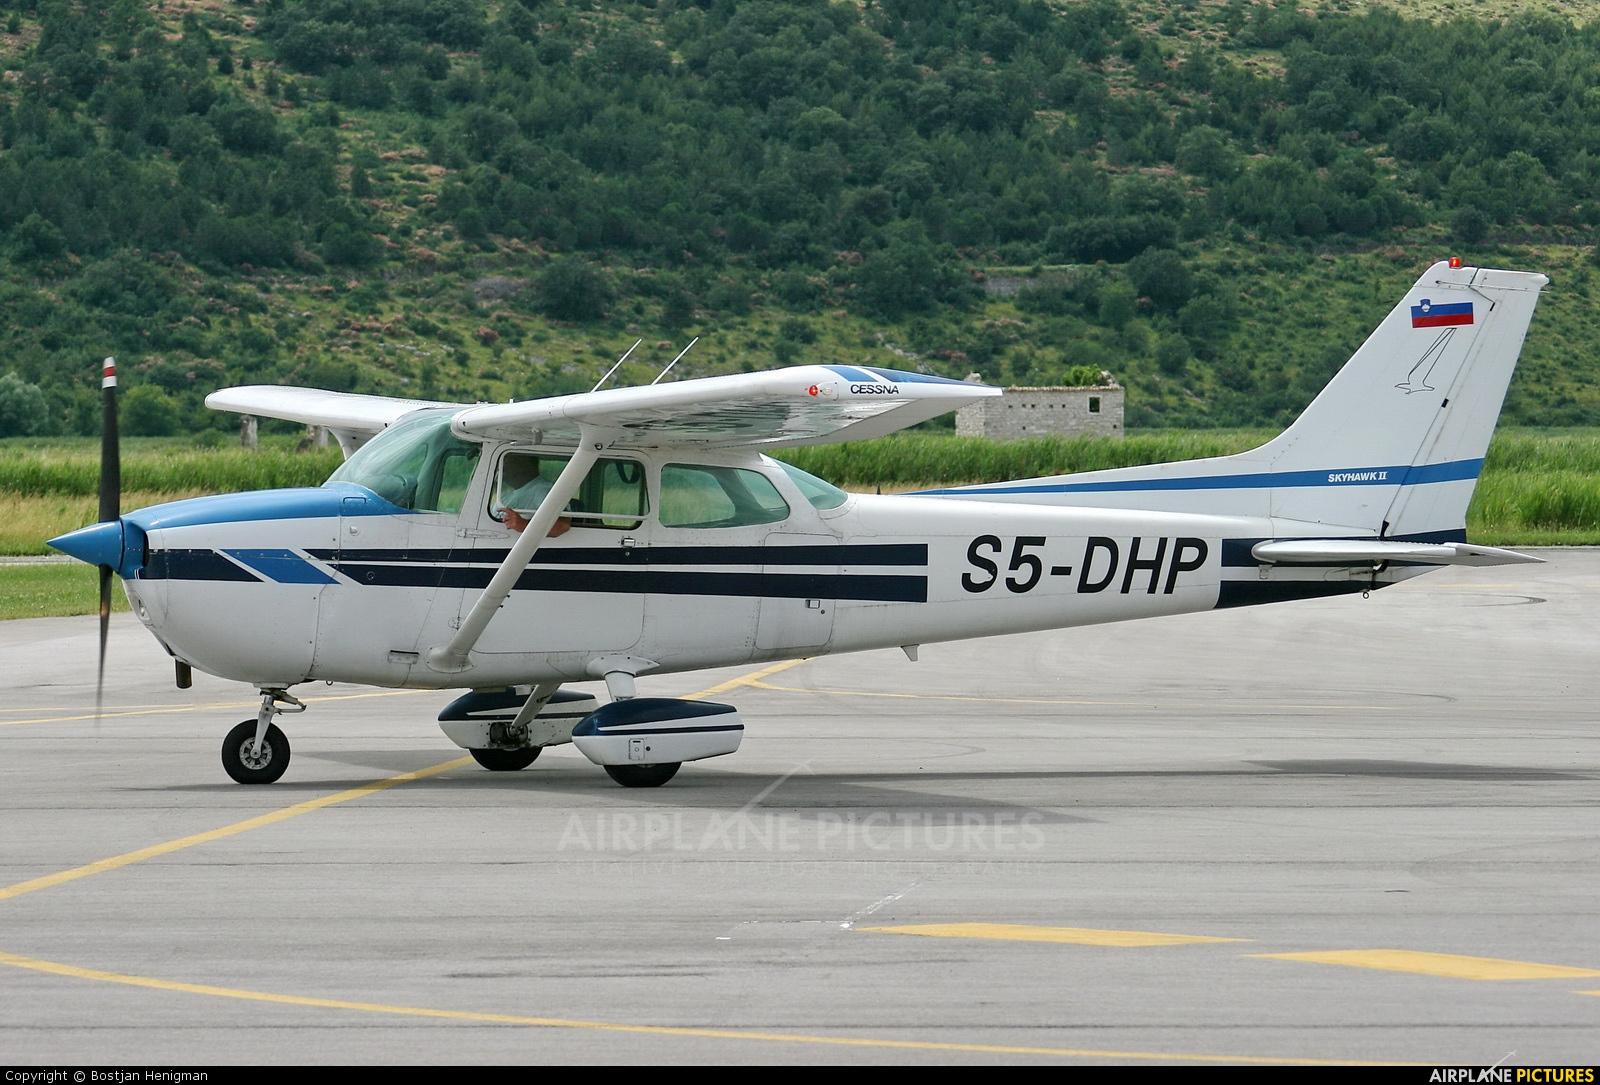 Private S5-DHP aircraft at Portoroz